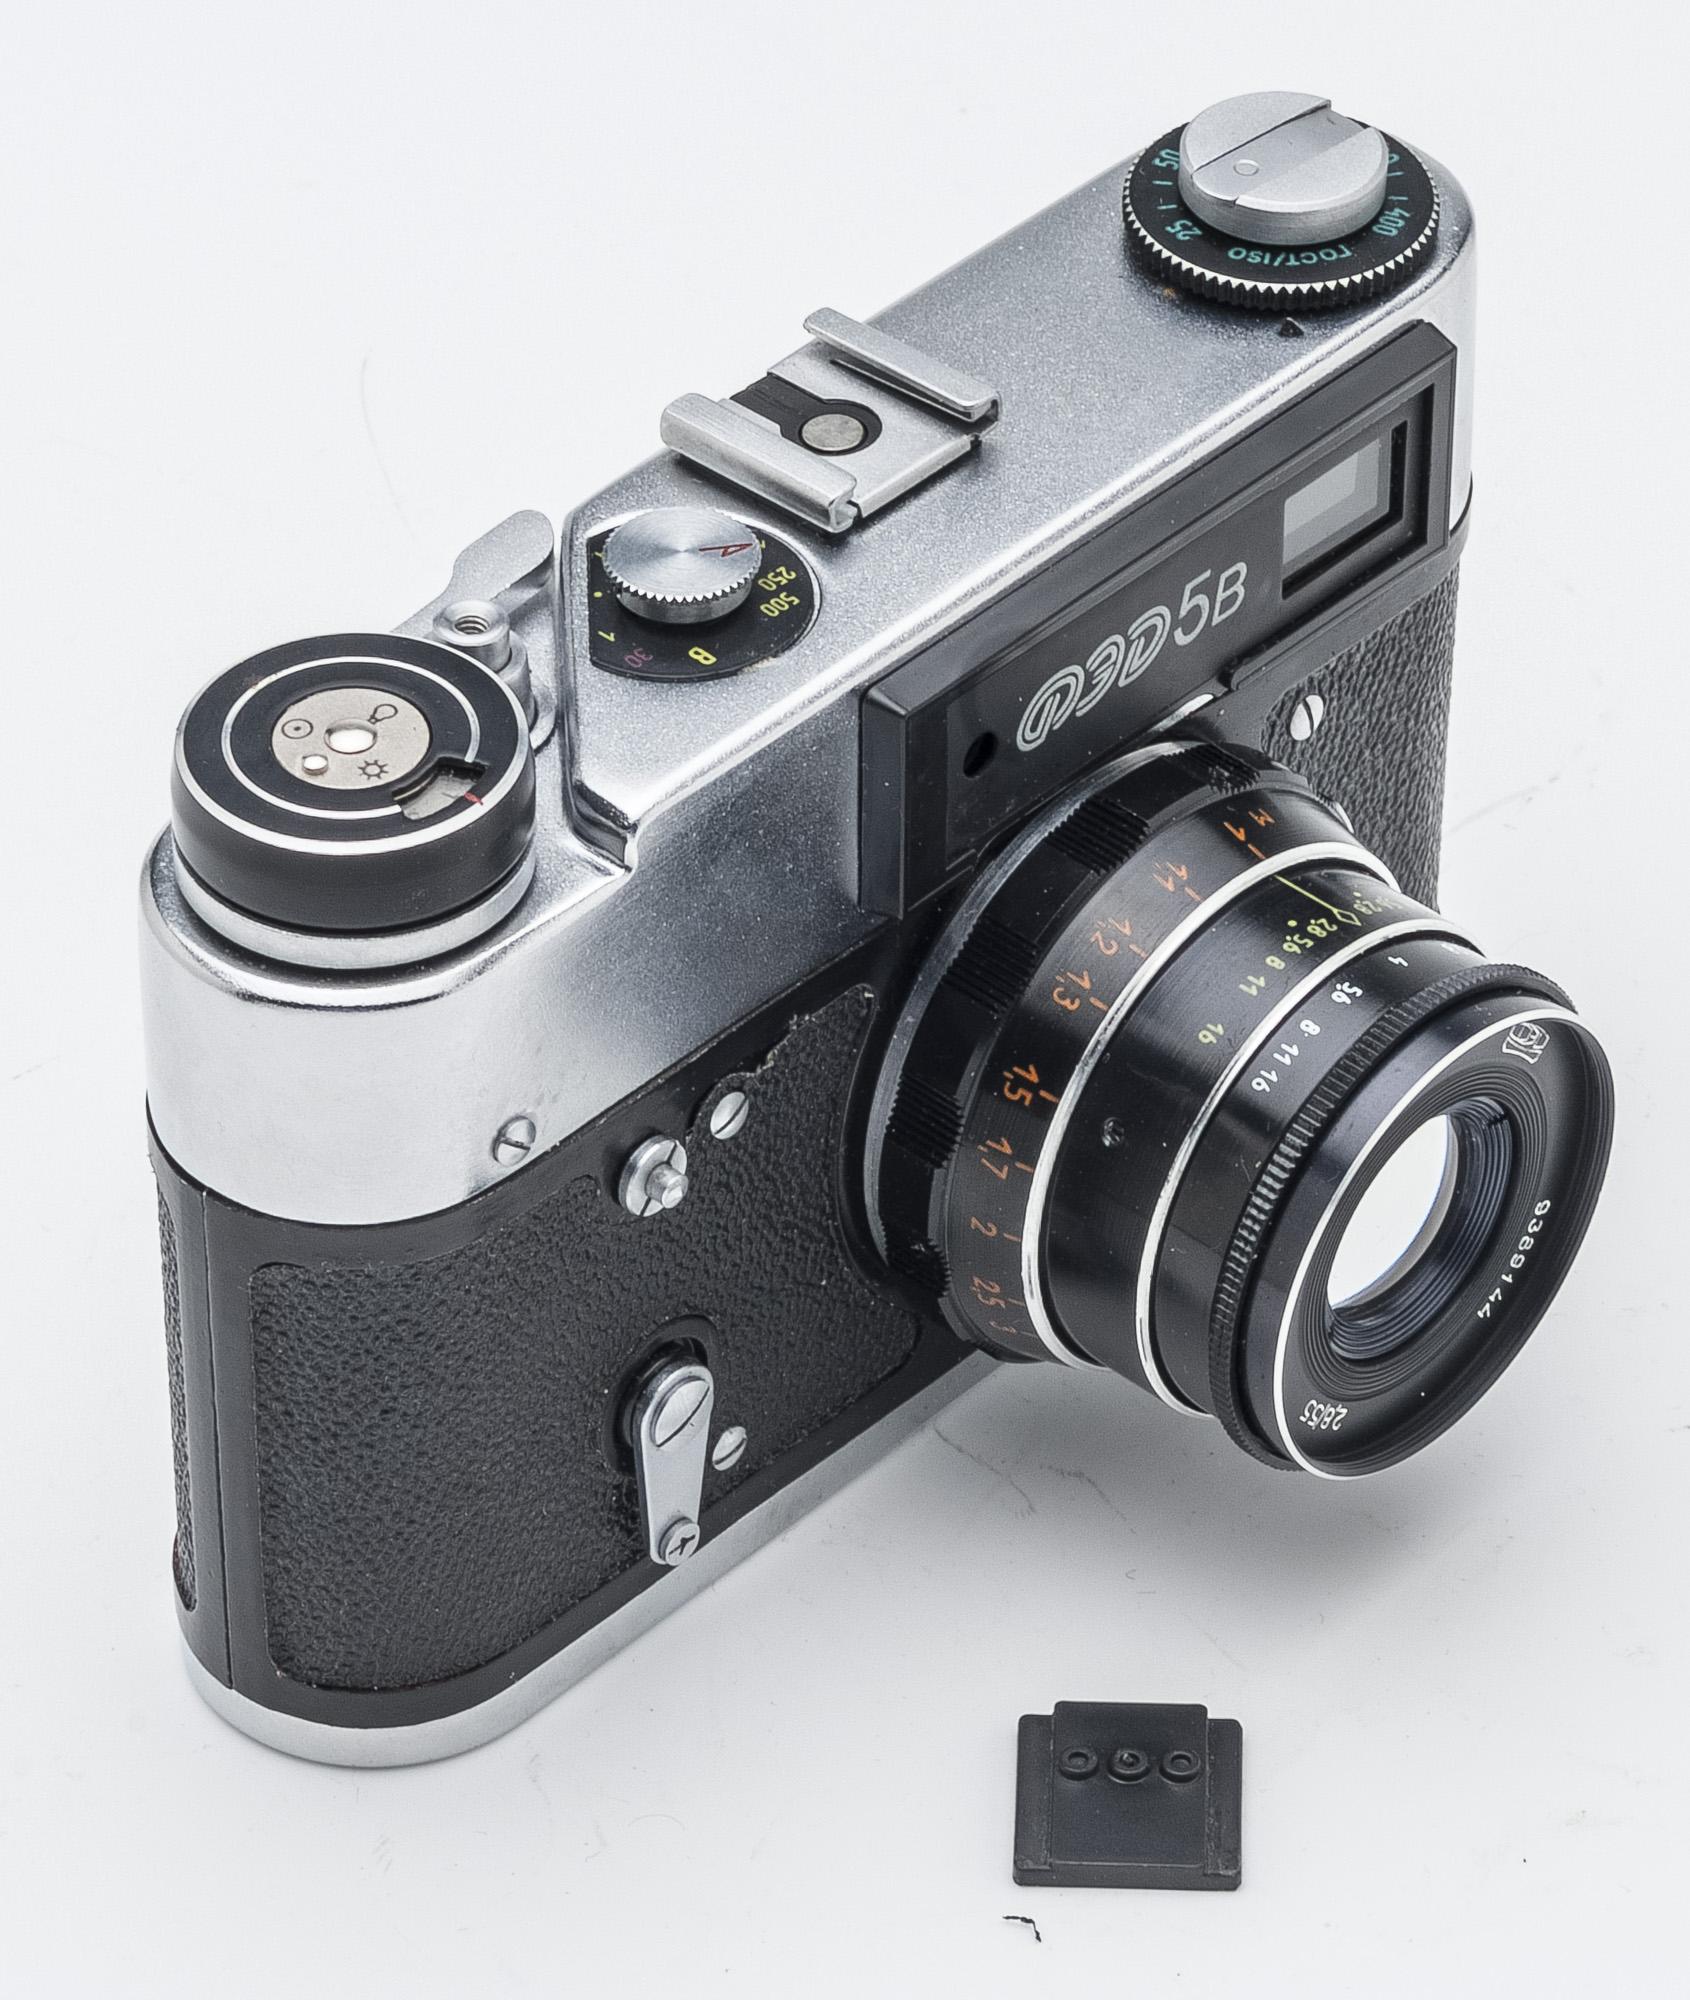 FED 5B FED5B FED-5B 55mm Optik Sucherkamera Kamera Gehäuse Body